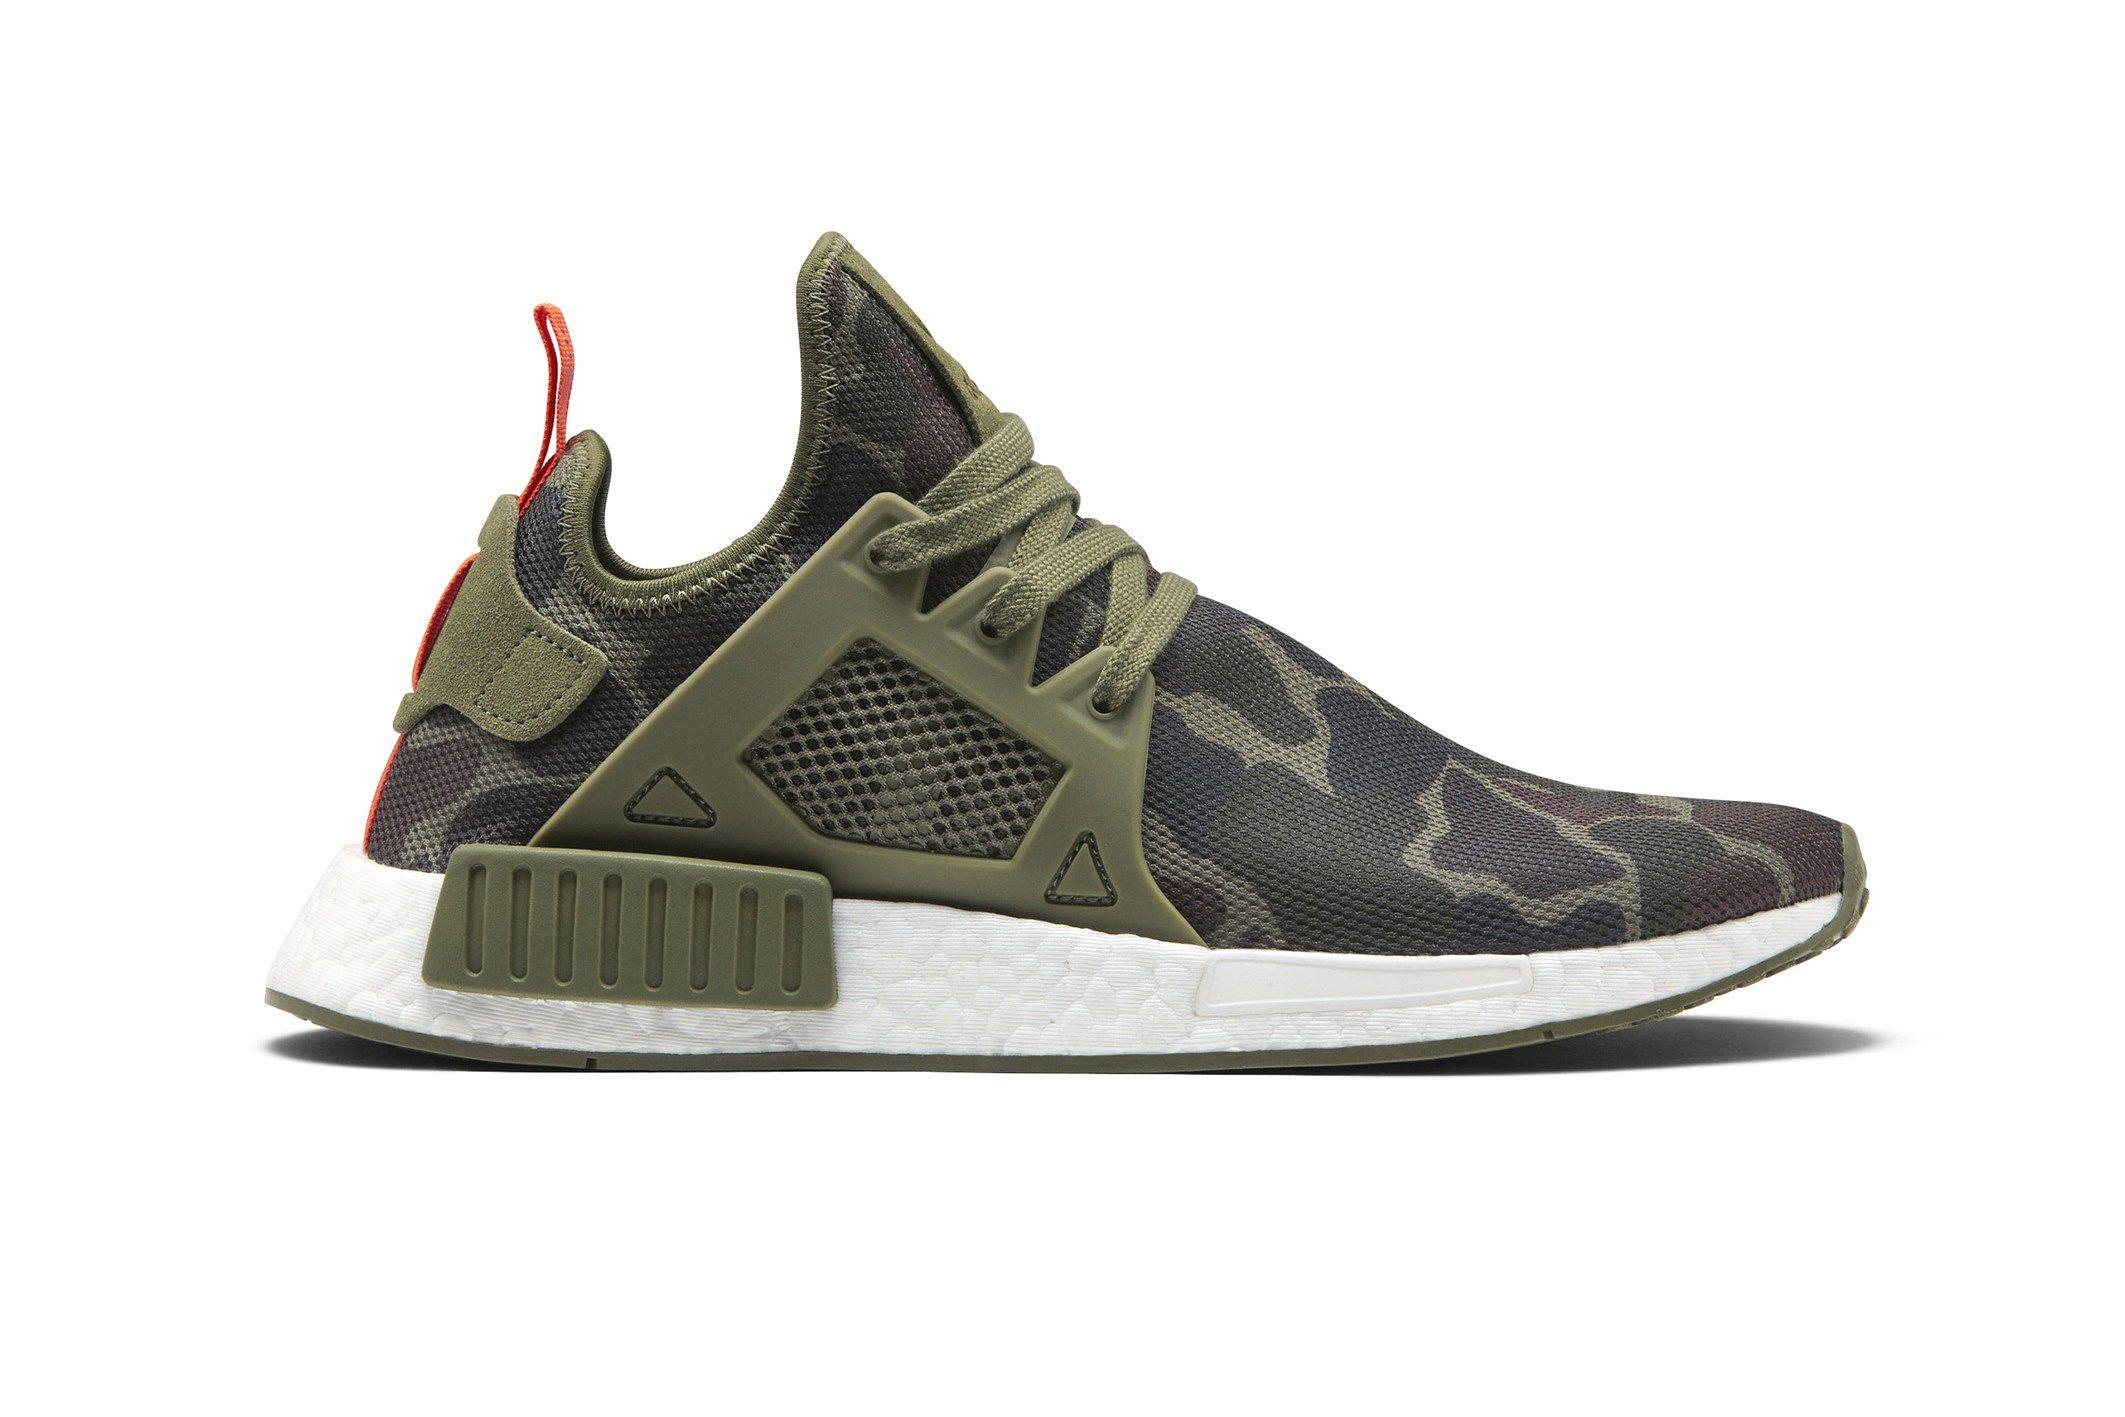 NMD Runner Luxury PK Glitch Camo Cblack Sneaker